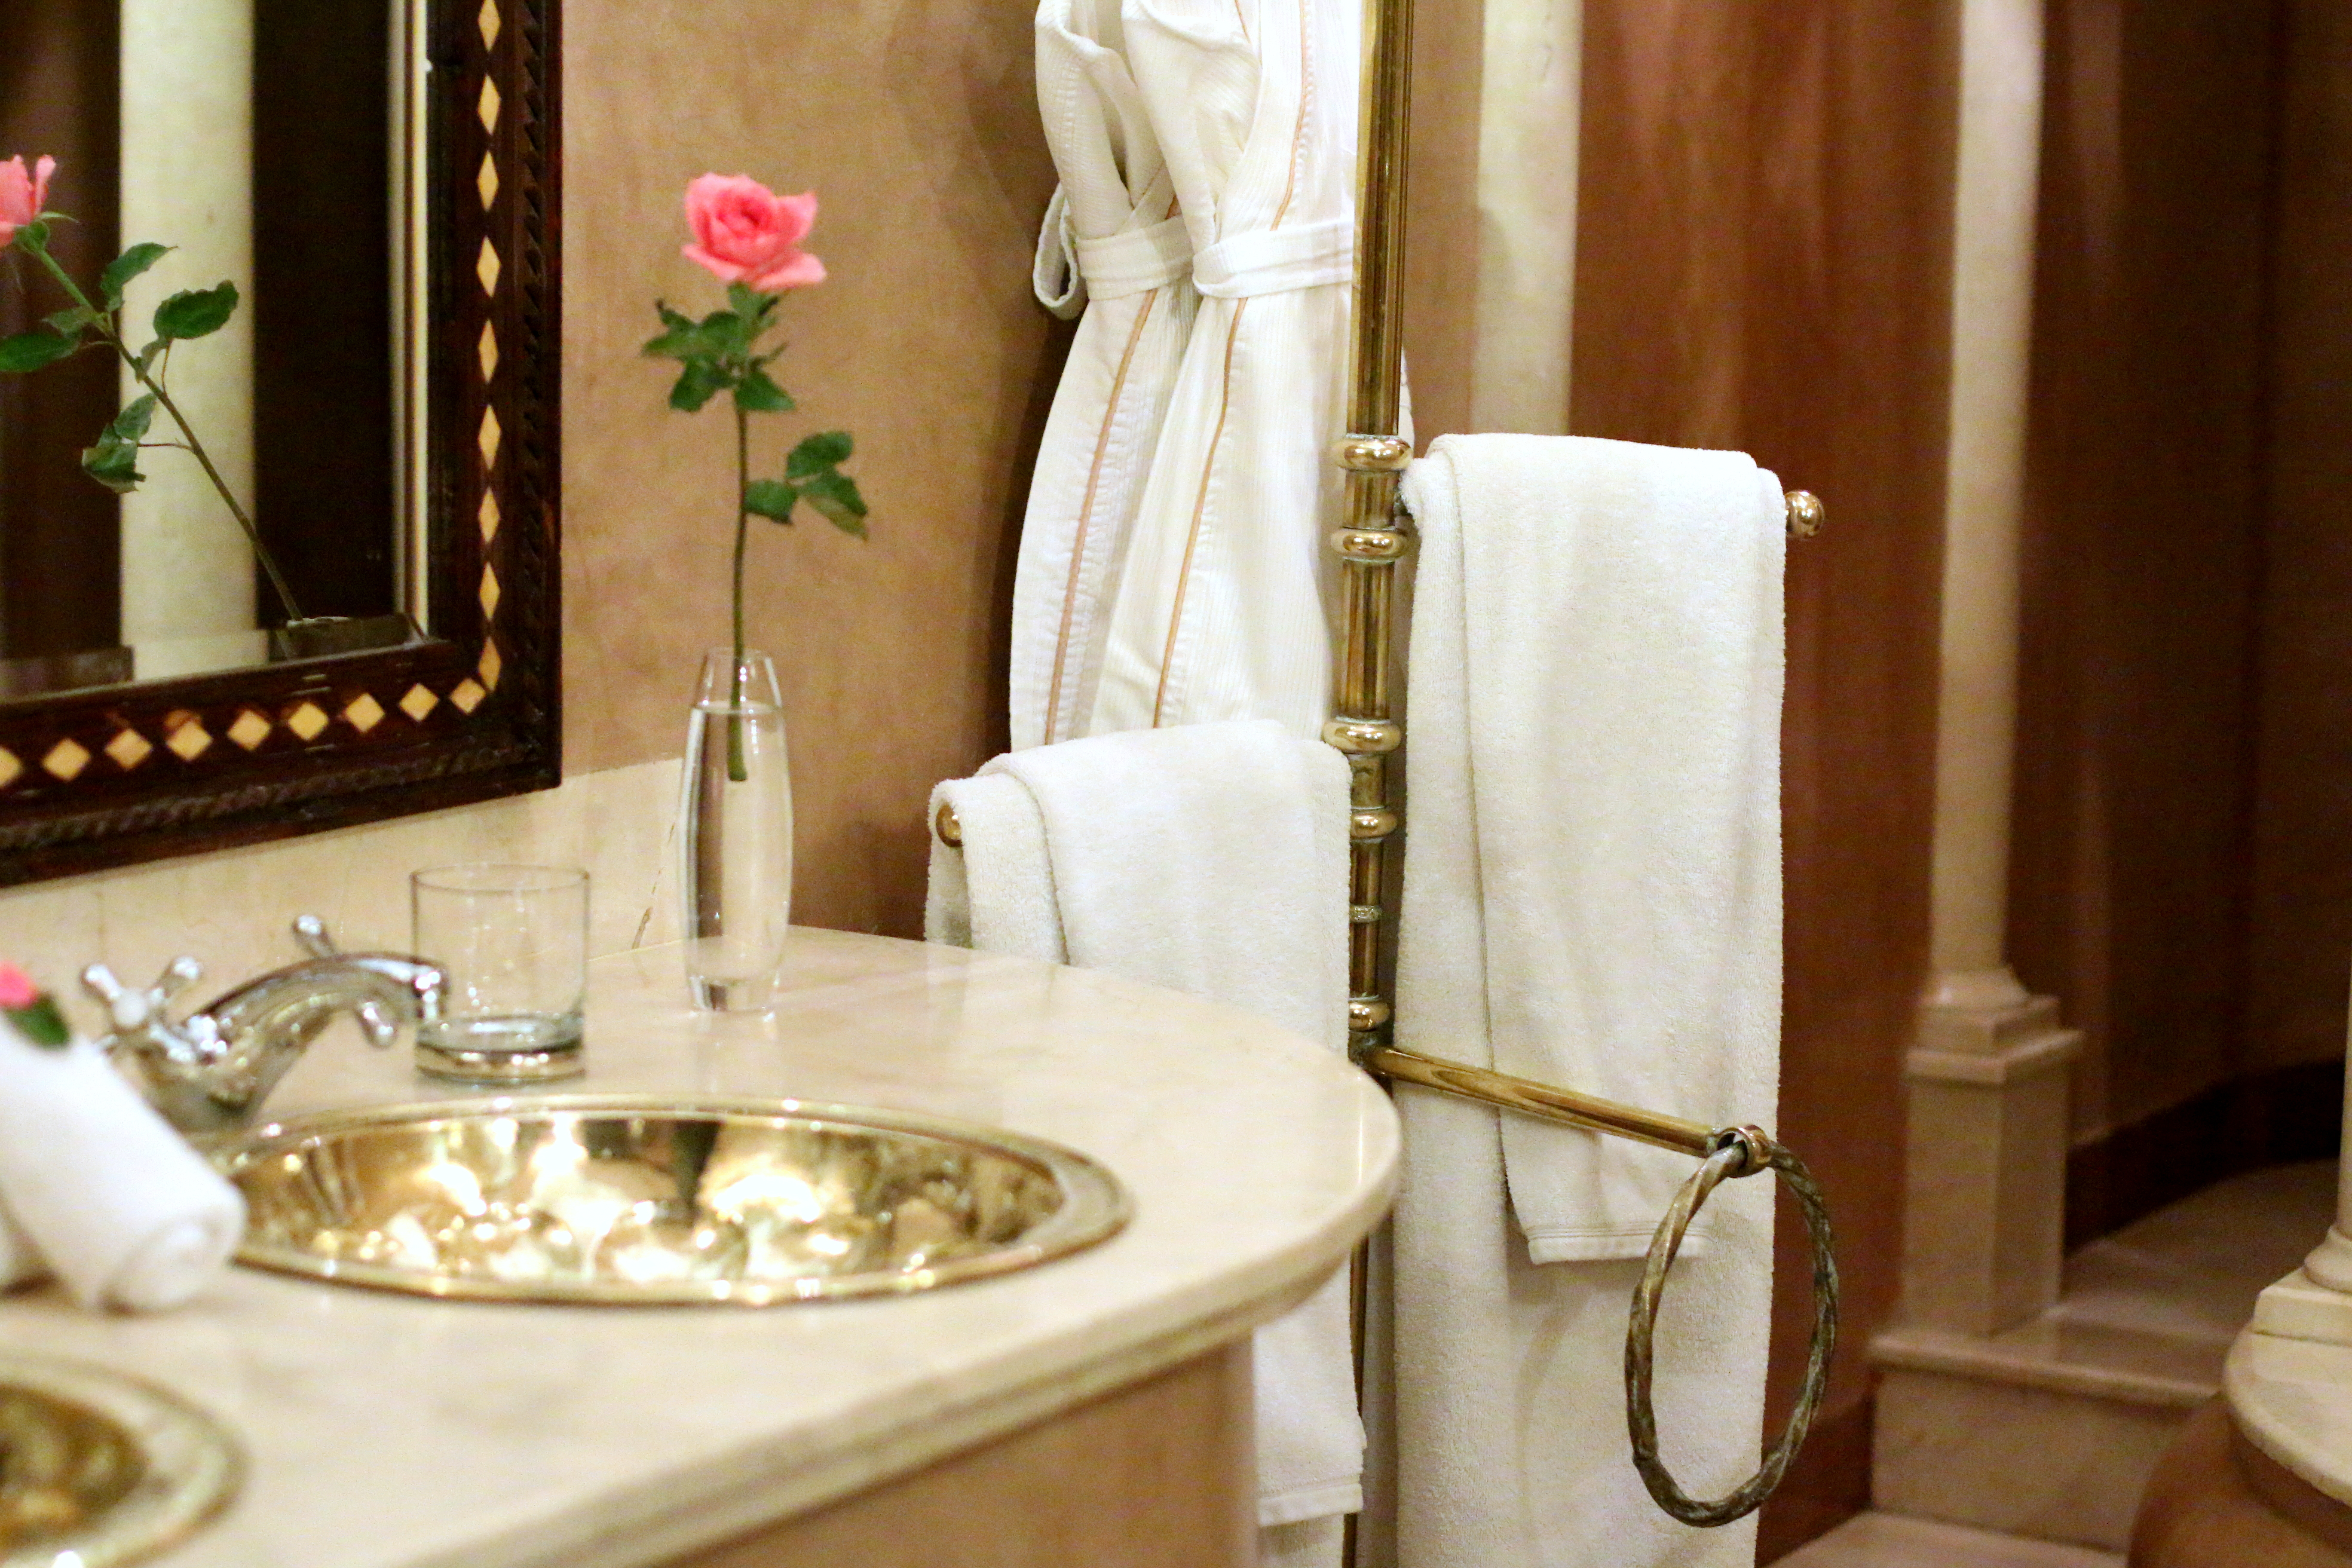 la sultana hotel review travelblog travelblogger reise blog erfahrung bericht blogpost